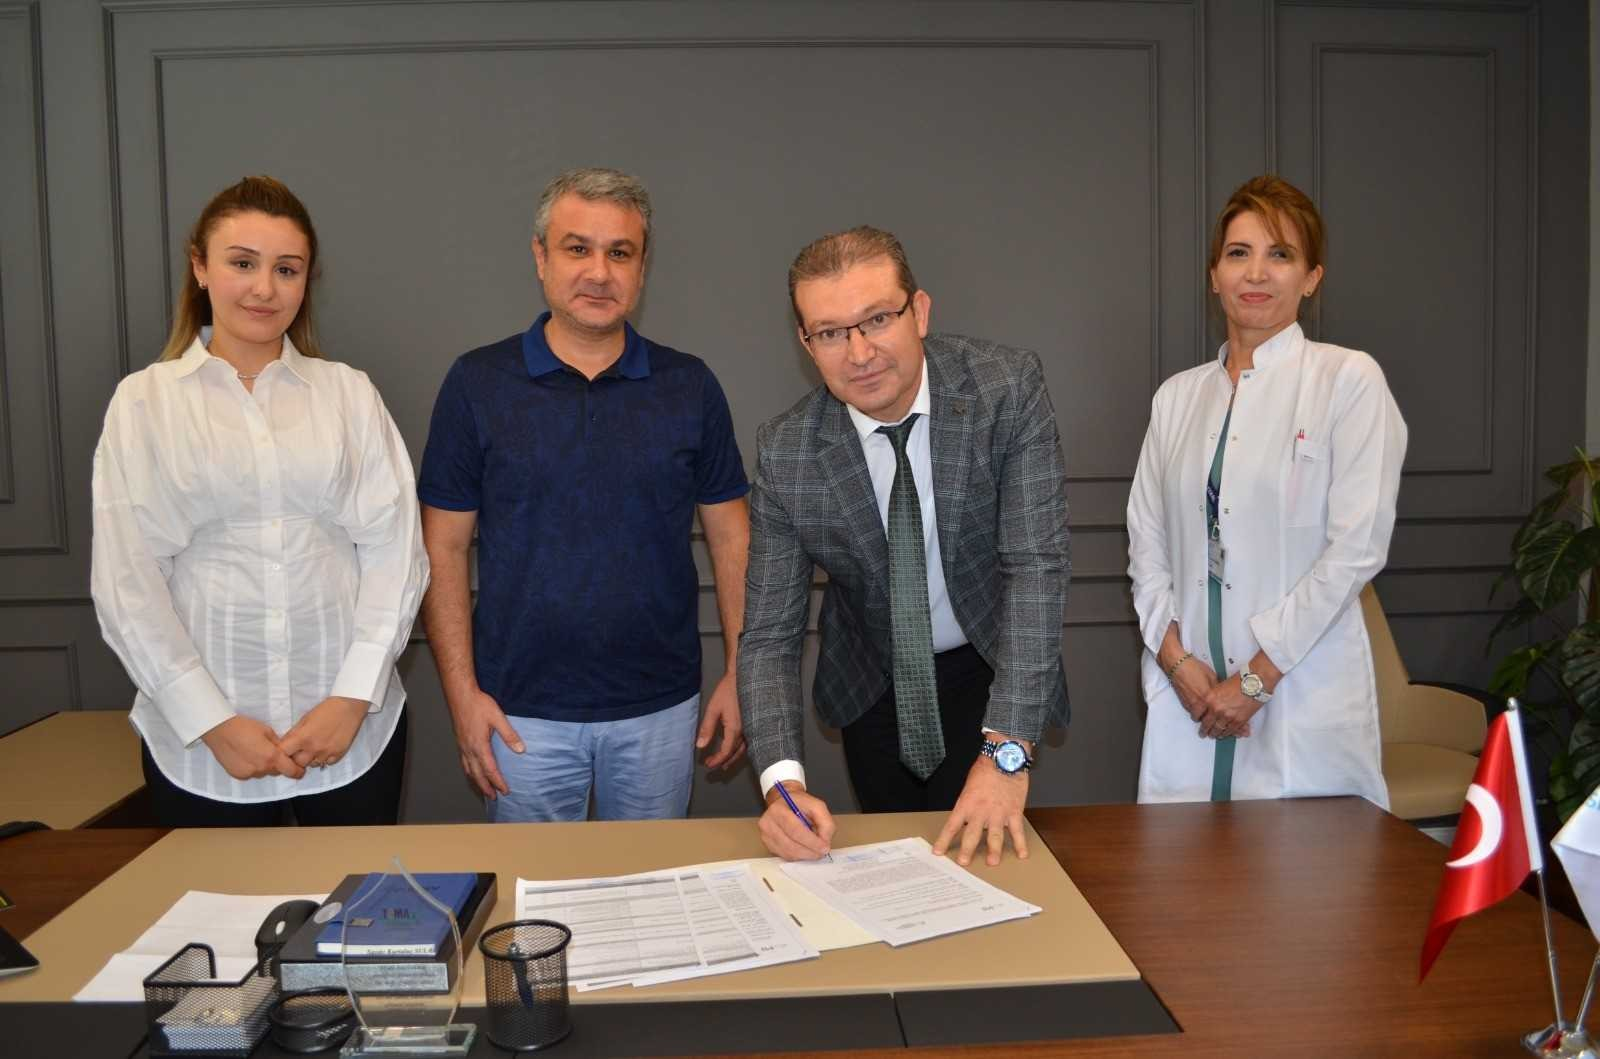 Sular Akademi Hastanesi PTT ile protokol imzaladı